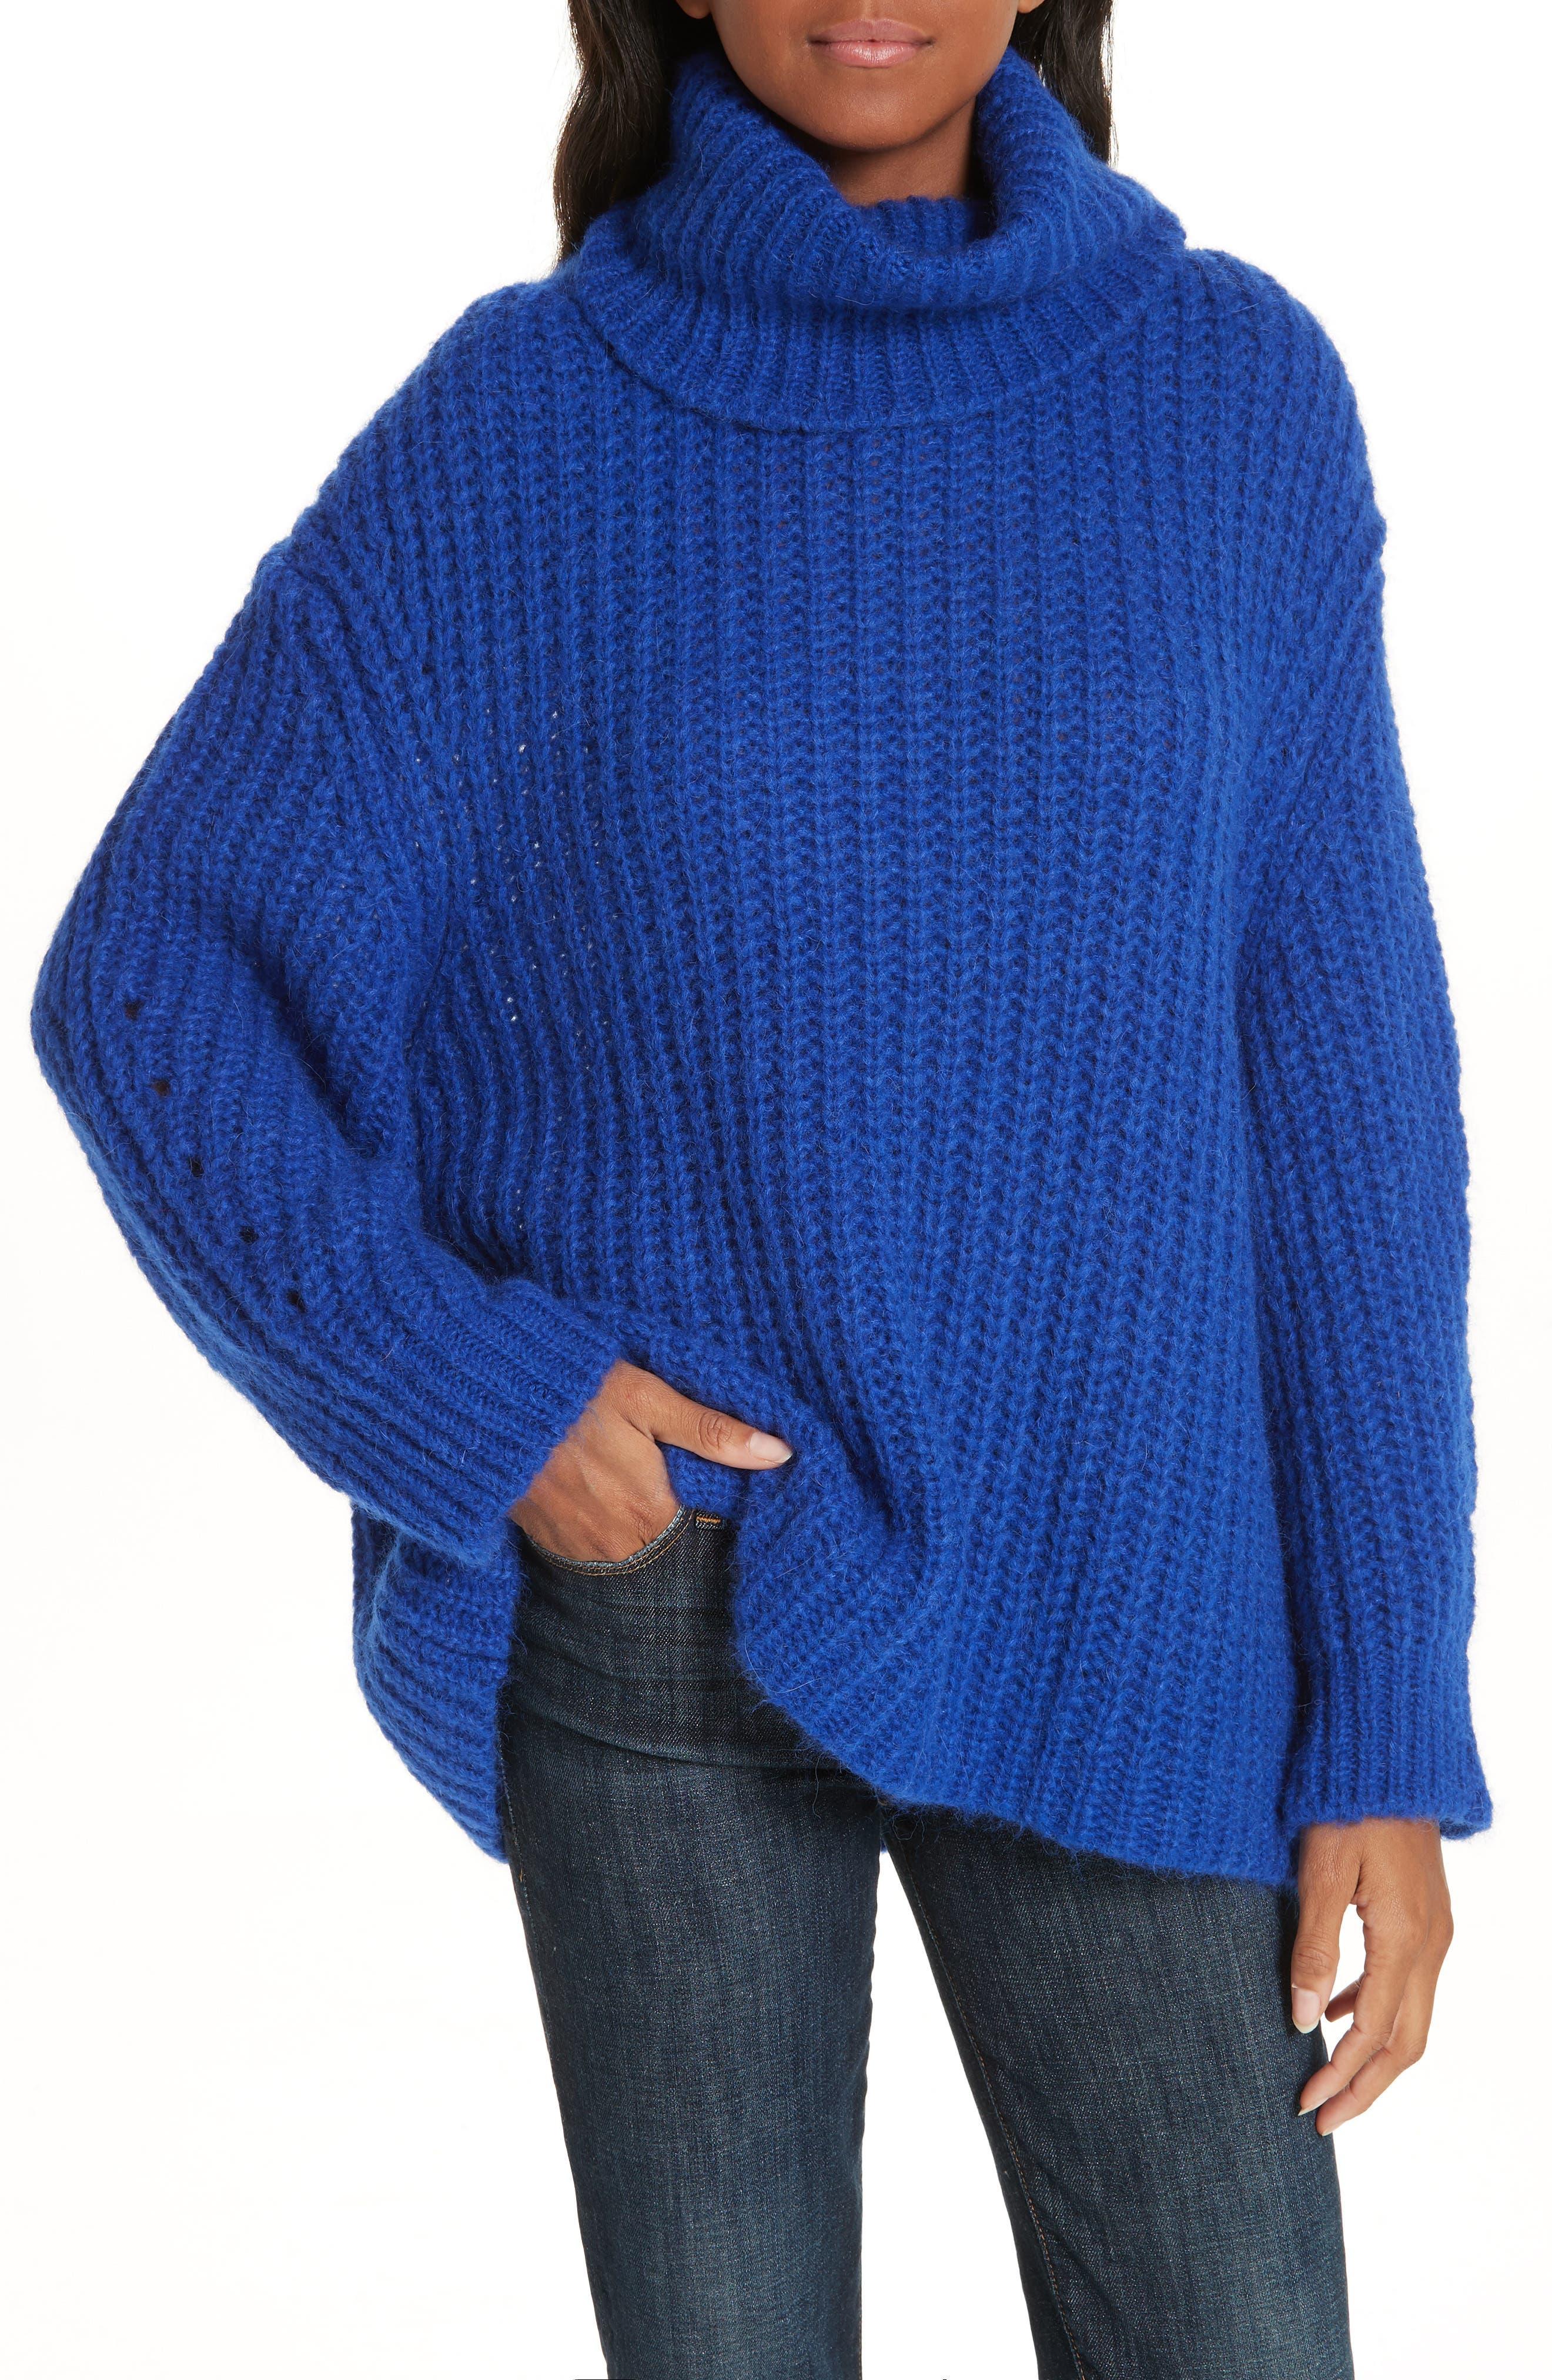 Emera Turtleneck Sweater,                             Main thumbnail 1, color,                             BLUE